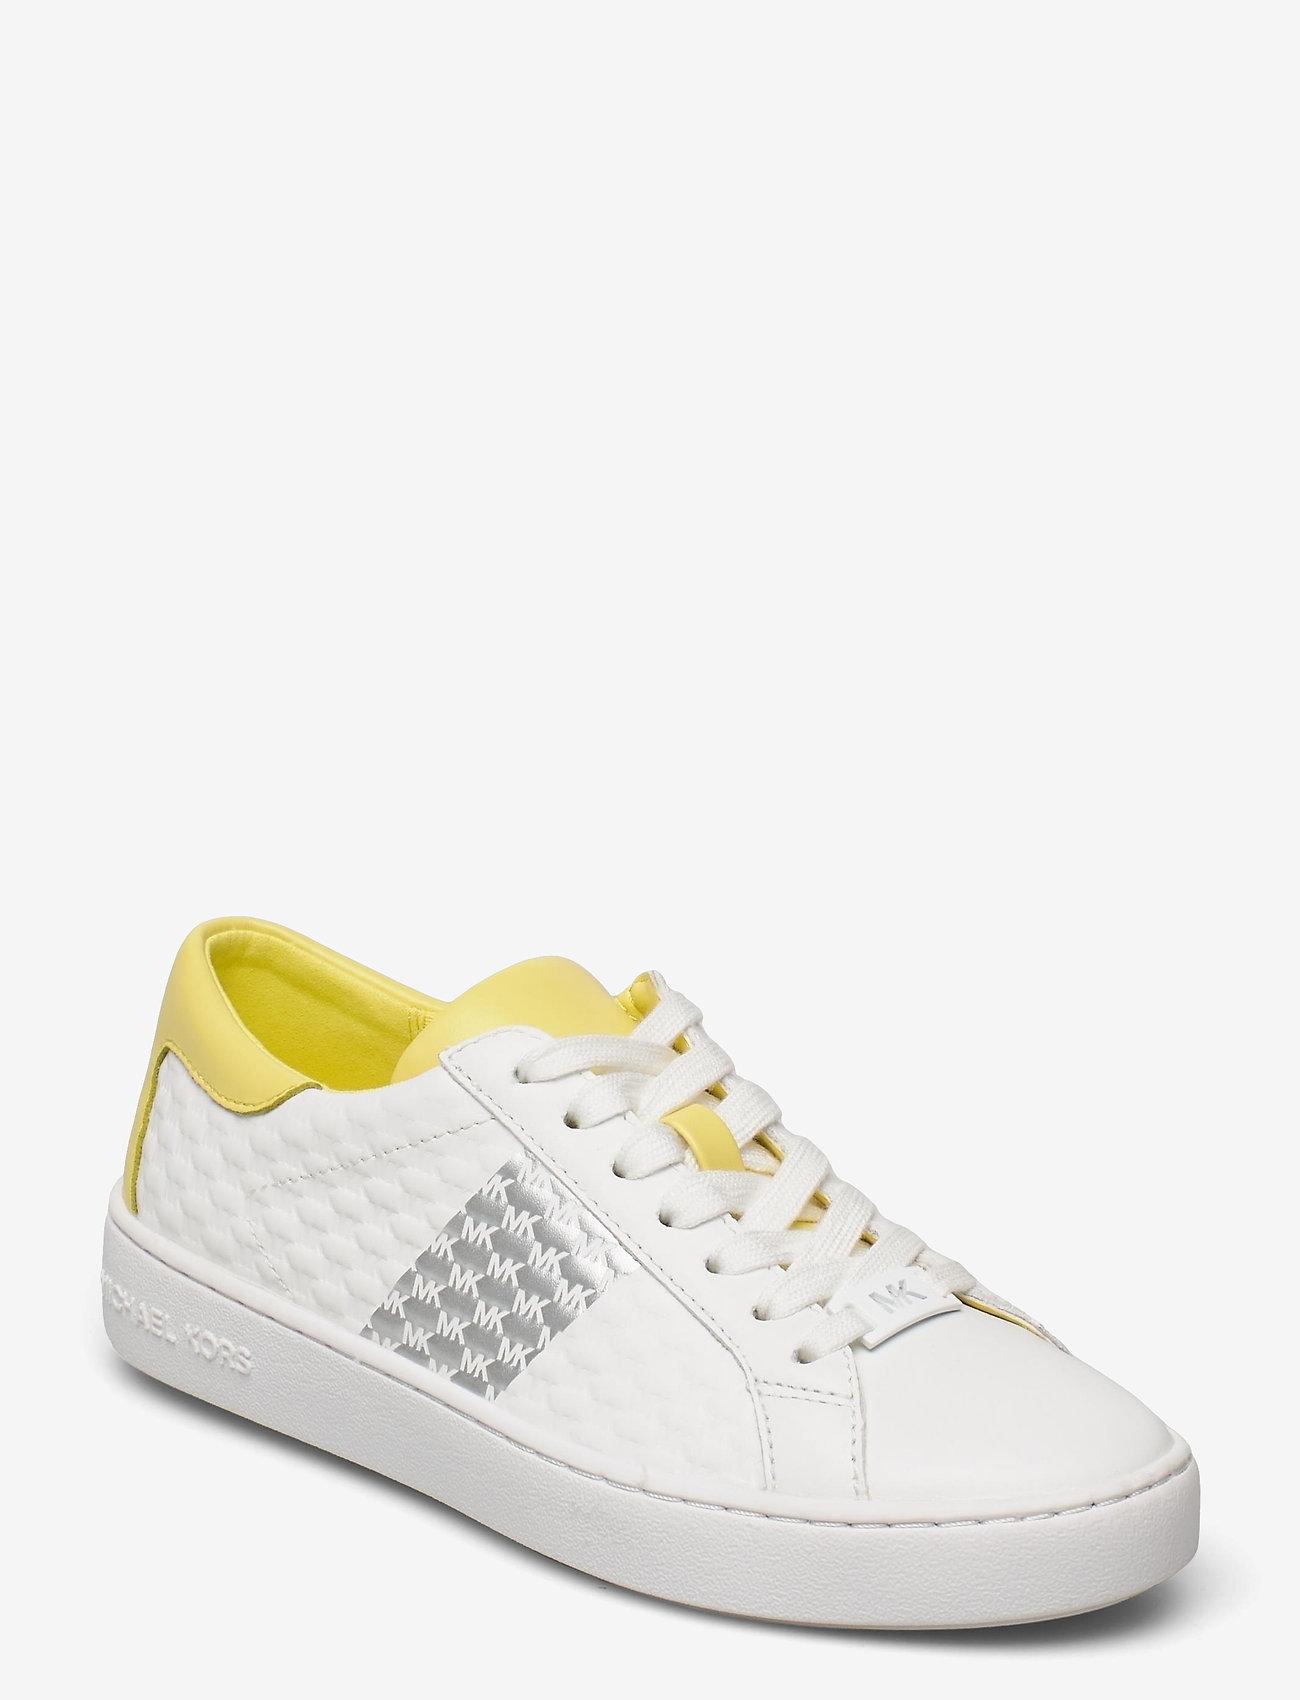 Michael Kors - COLBY SNEAKER - lage sneakers - limelight - 0